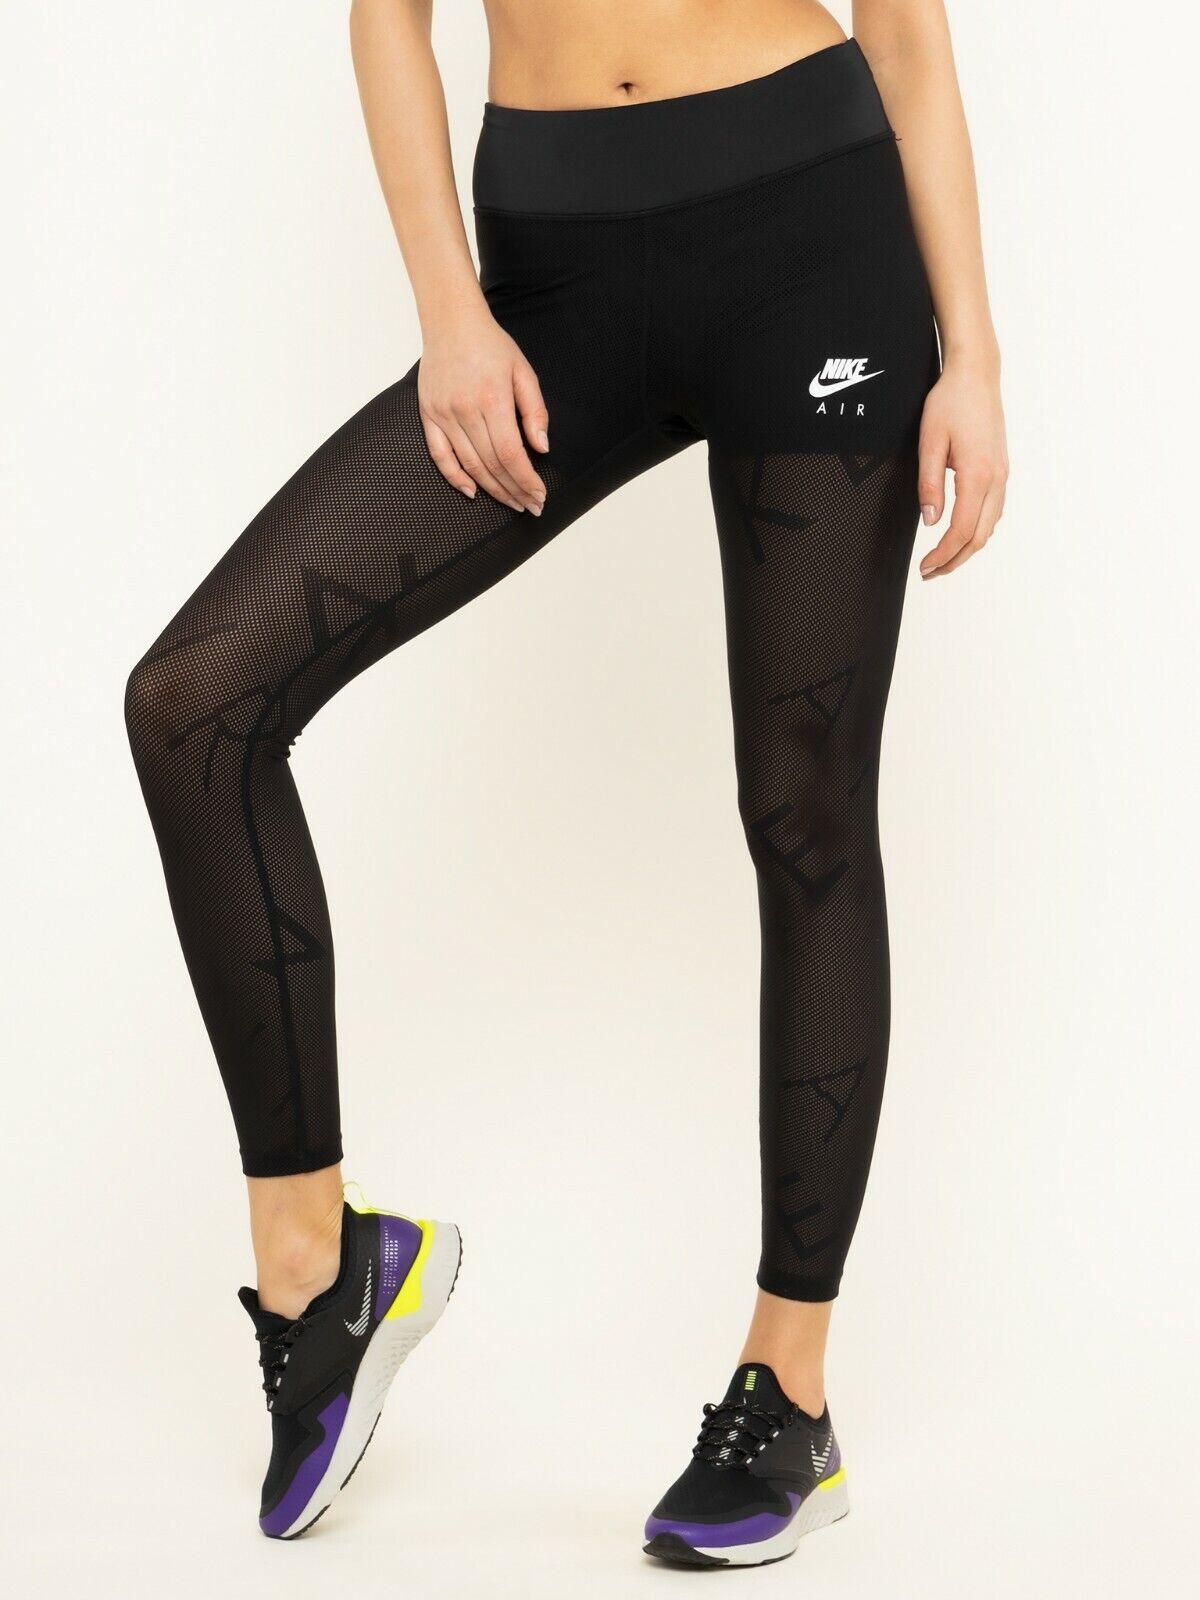 Nike Women's Small Air Black Tight Fit Training Gym 7/8 Length Leggings BV3806